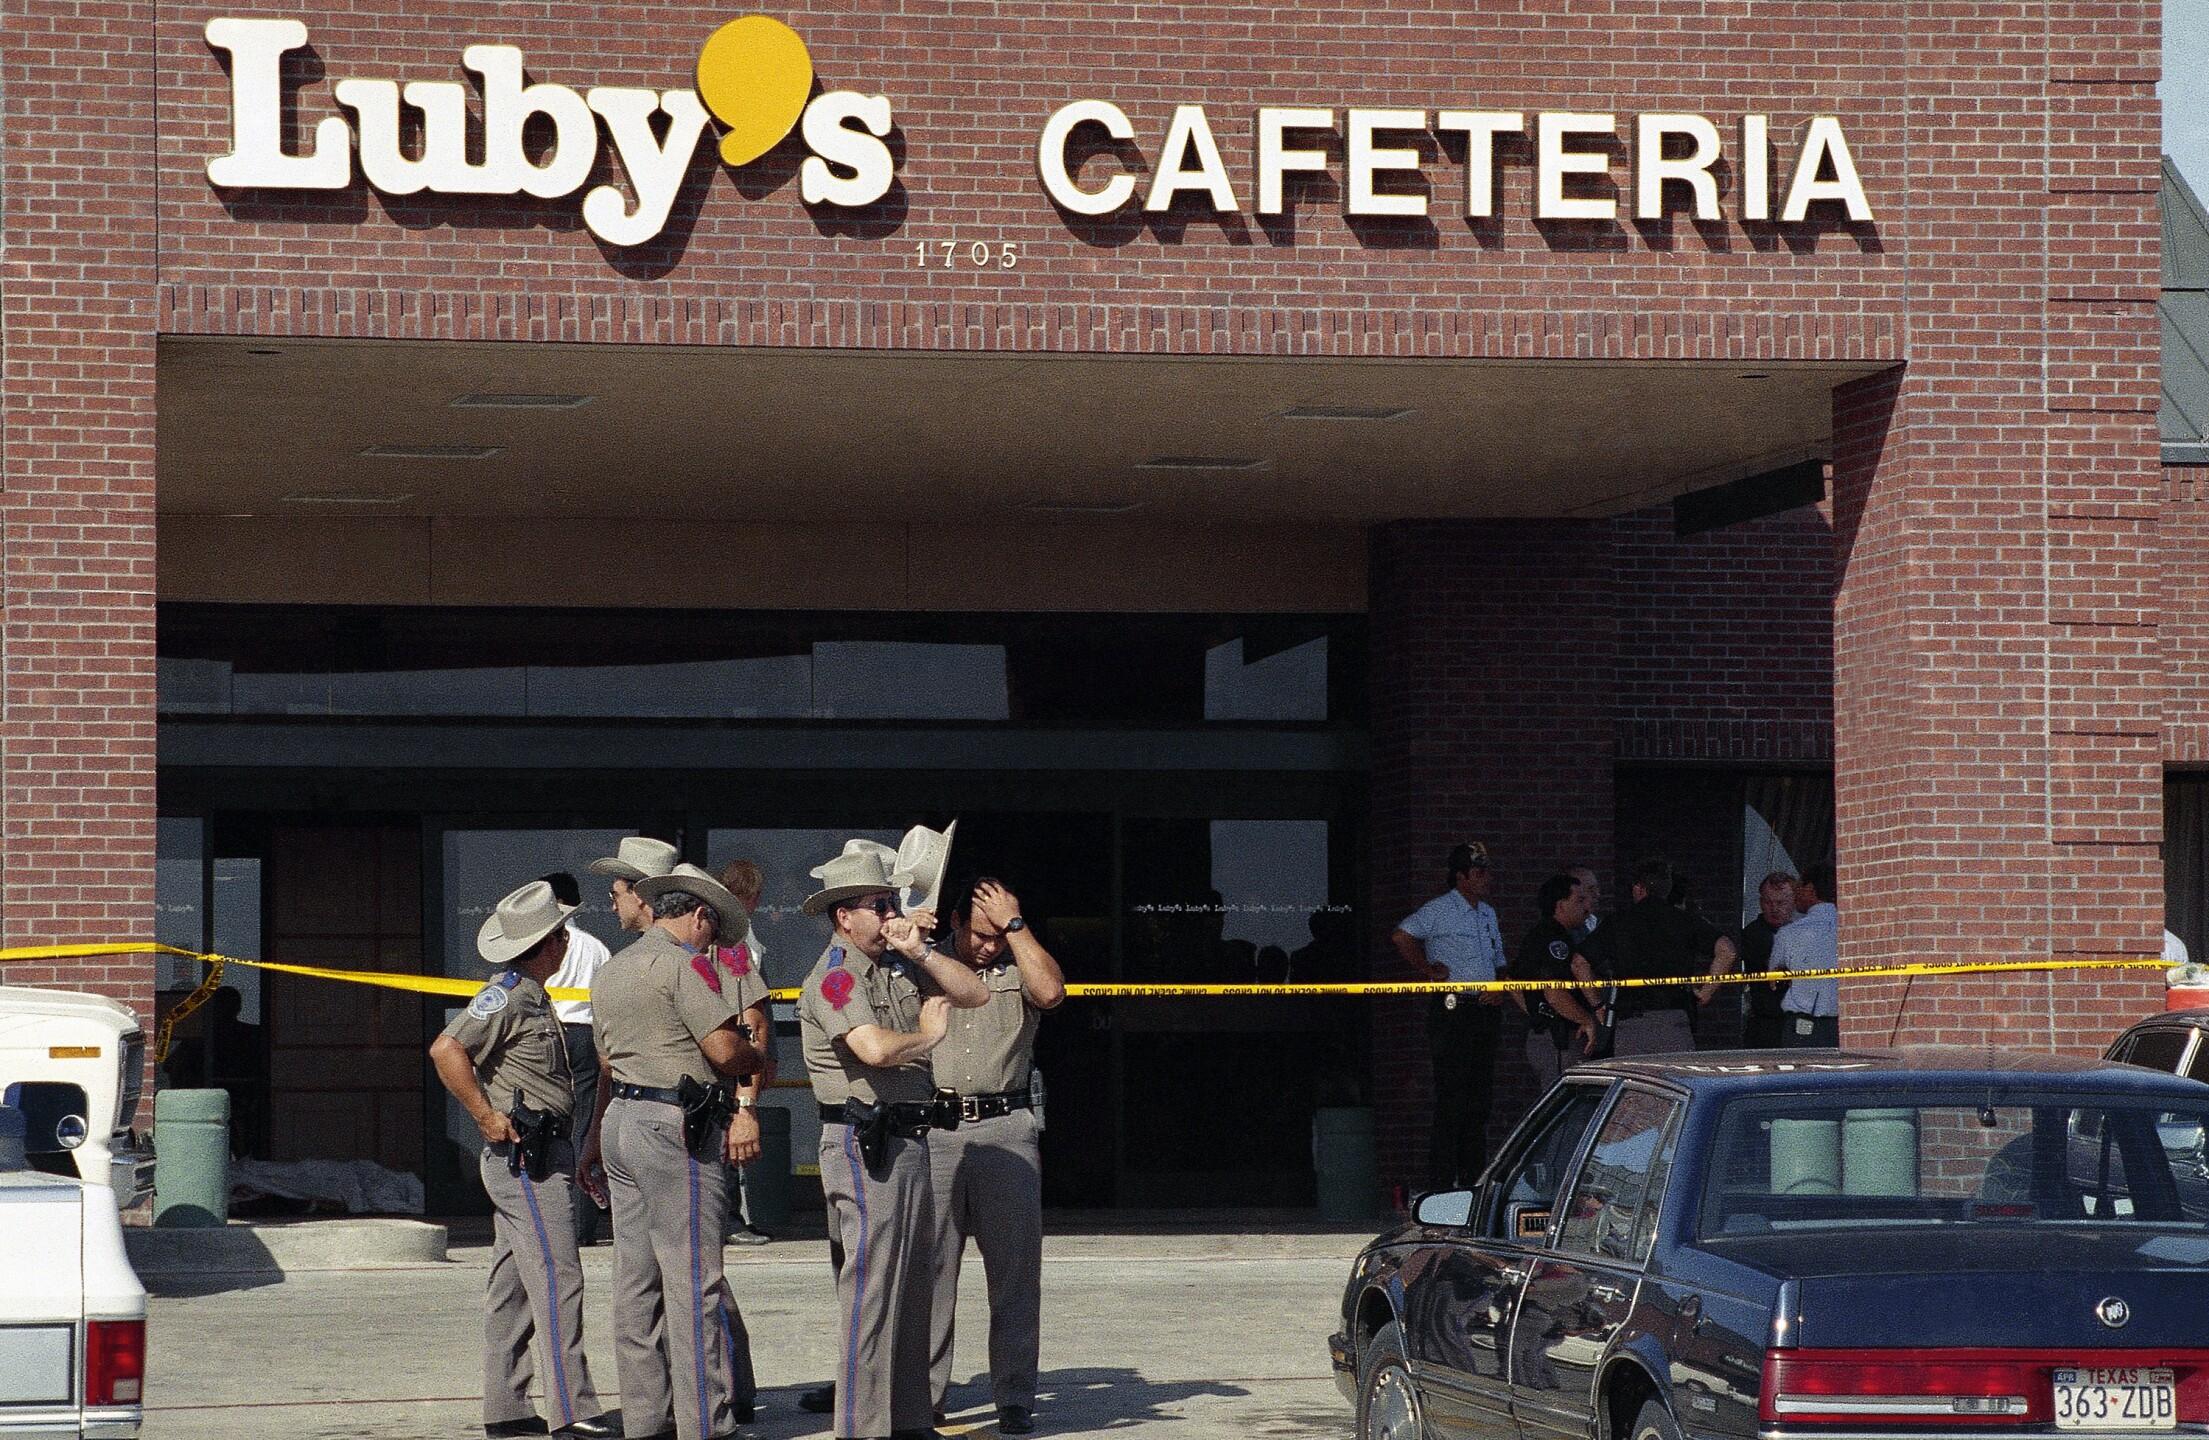 Exchange Church Shooting Luby's Massacre